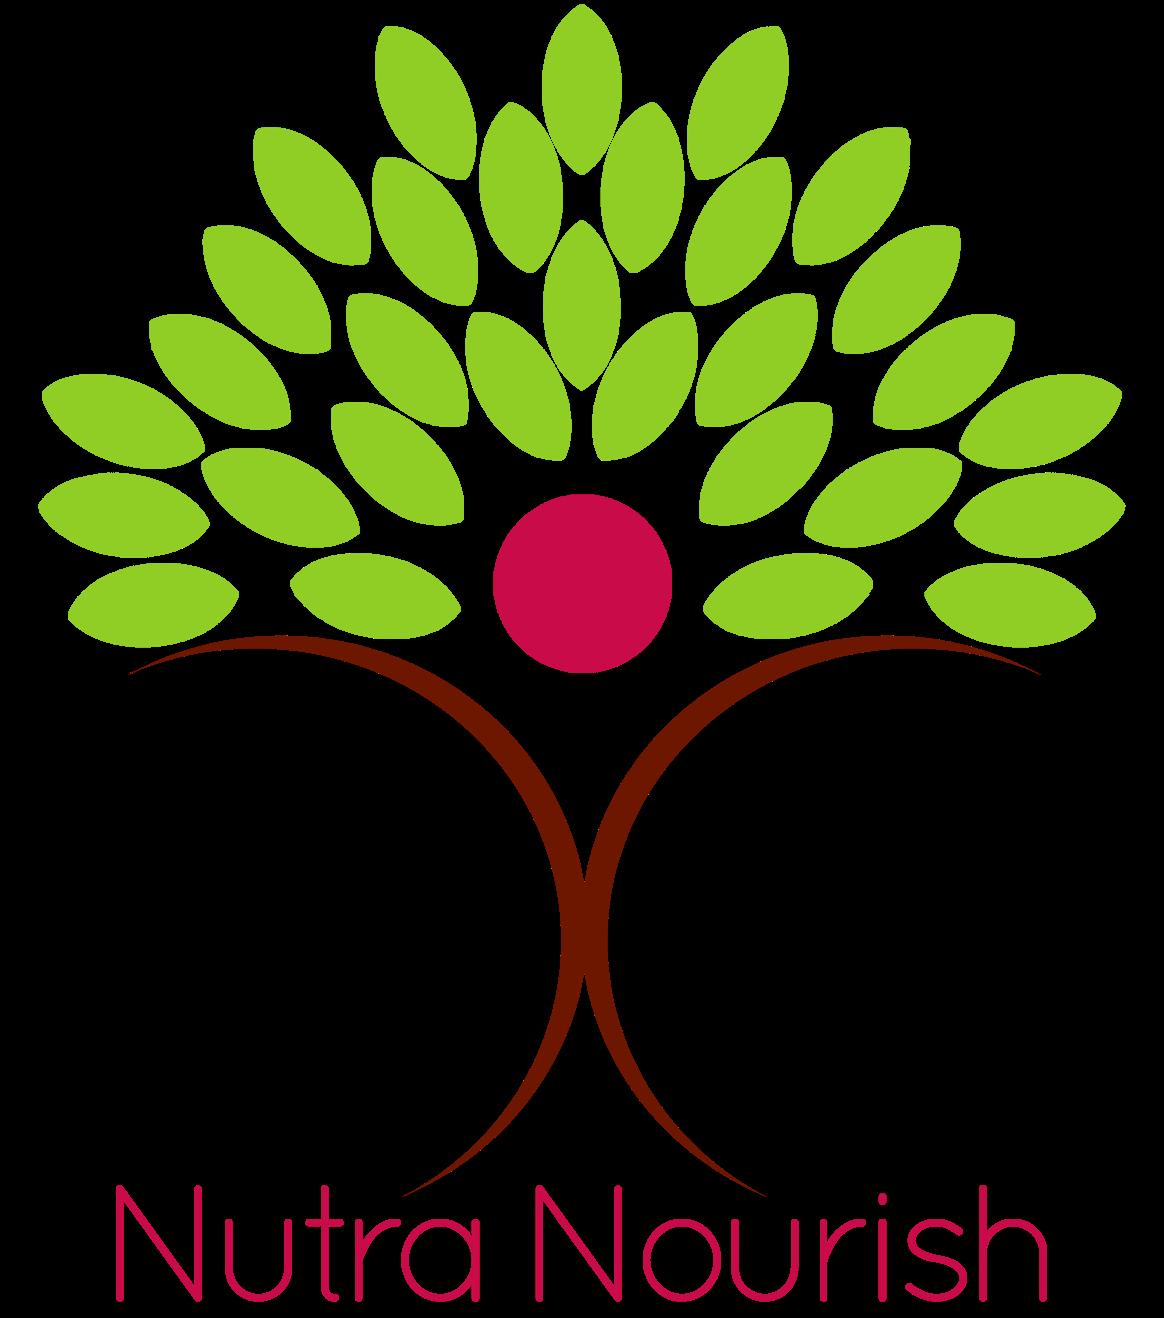 Nutra Nourish